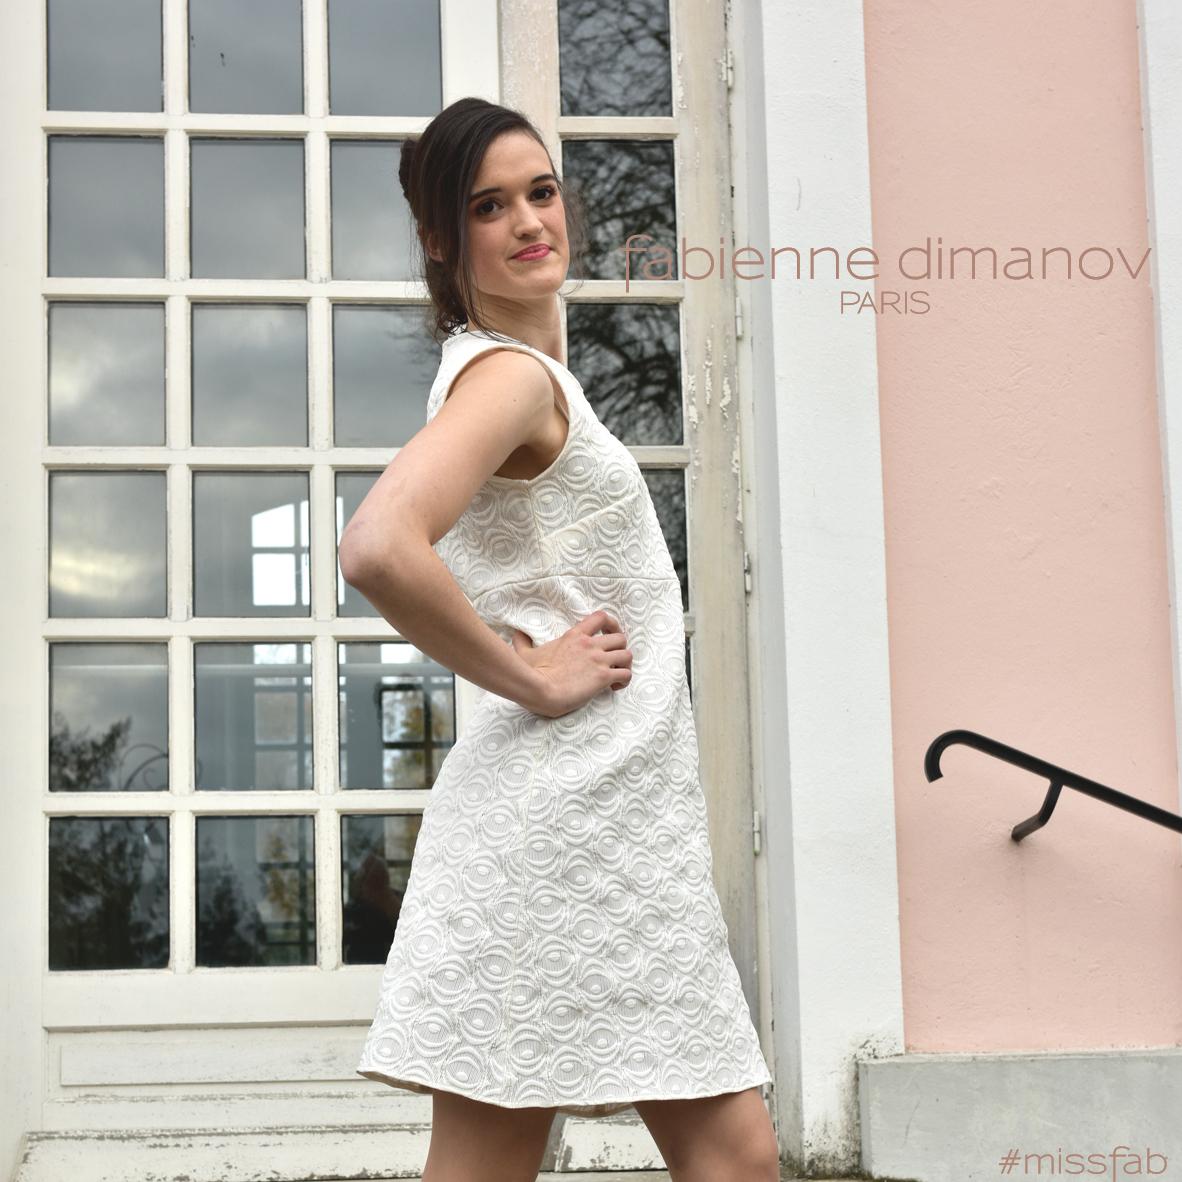 Robe perso #missfab - robe trapèze- Fabienne Dimanov Paris